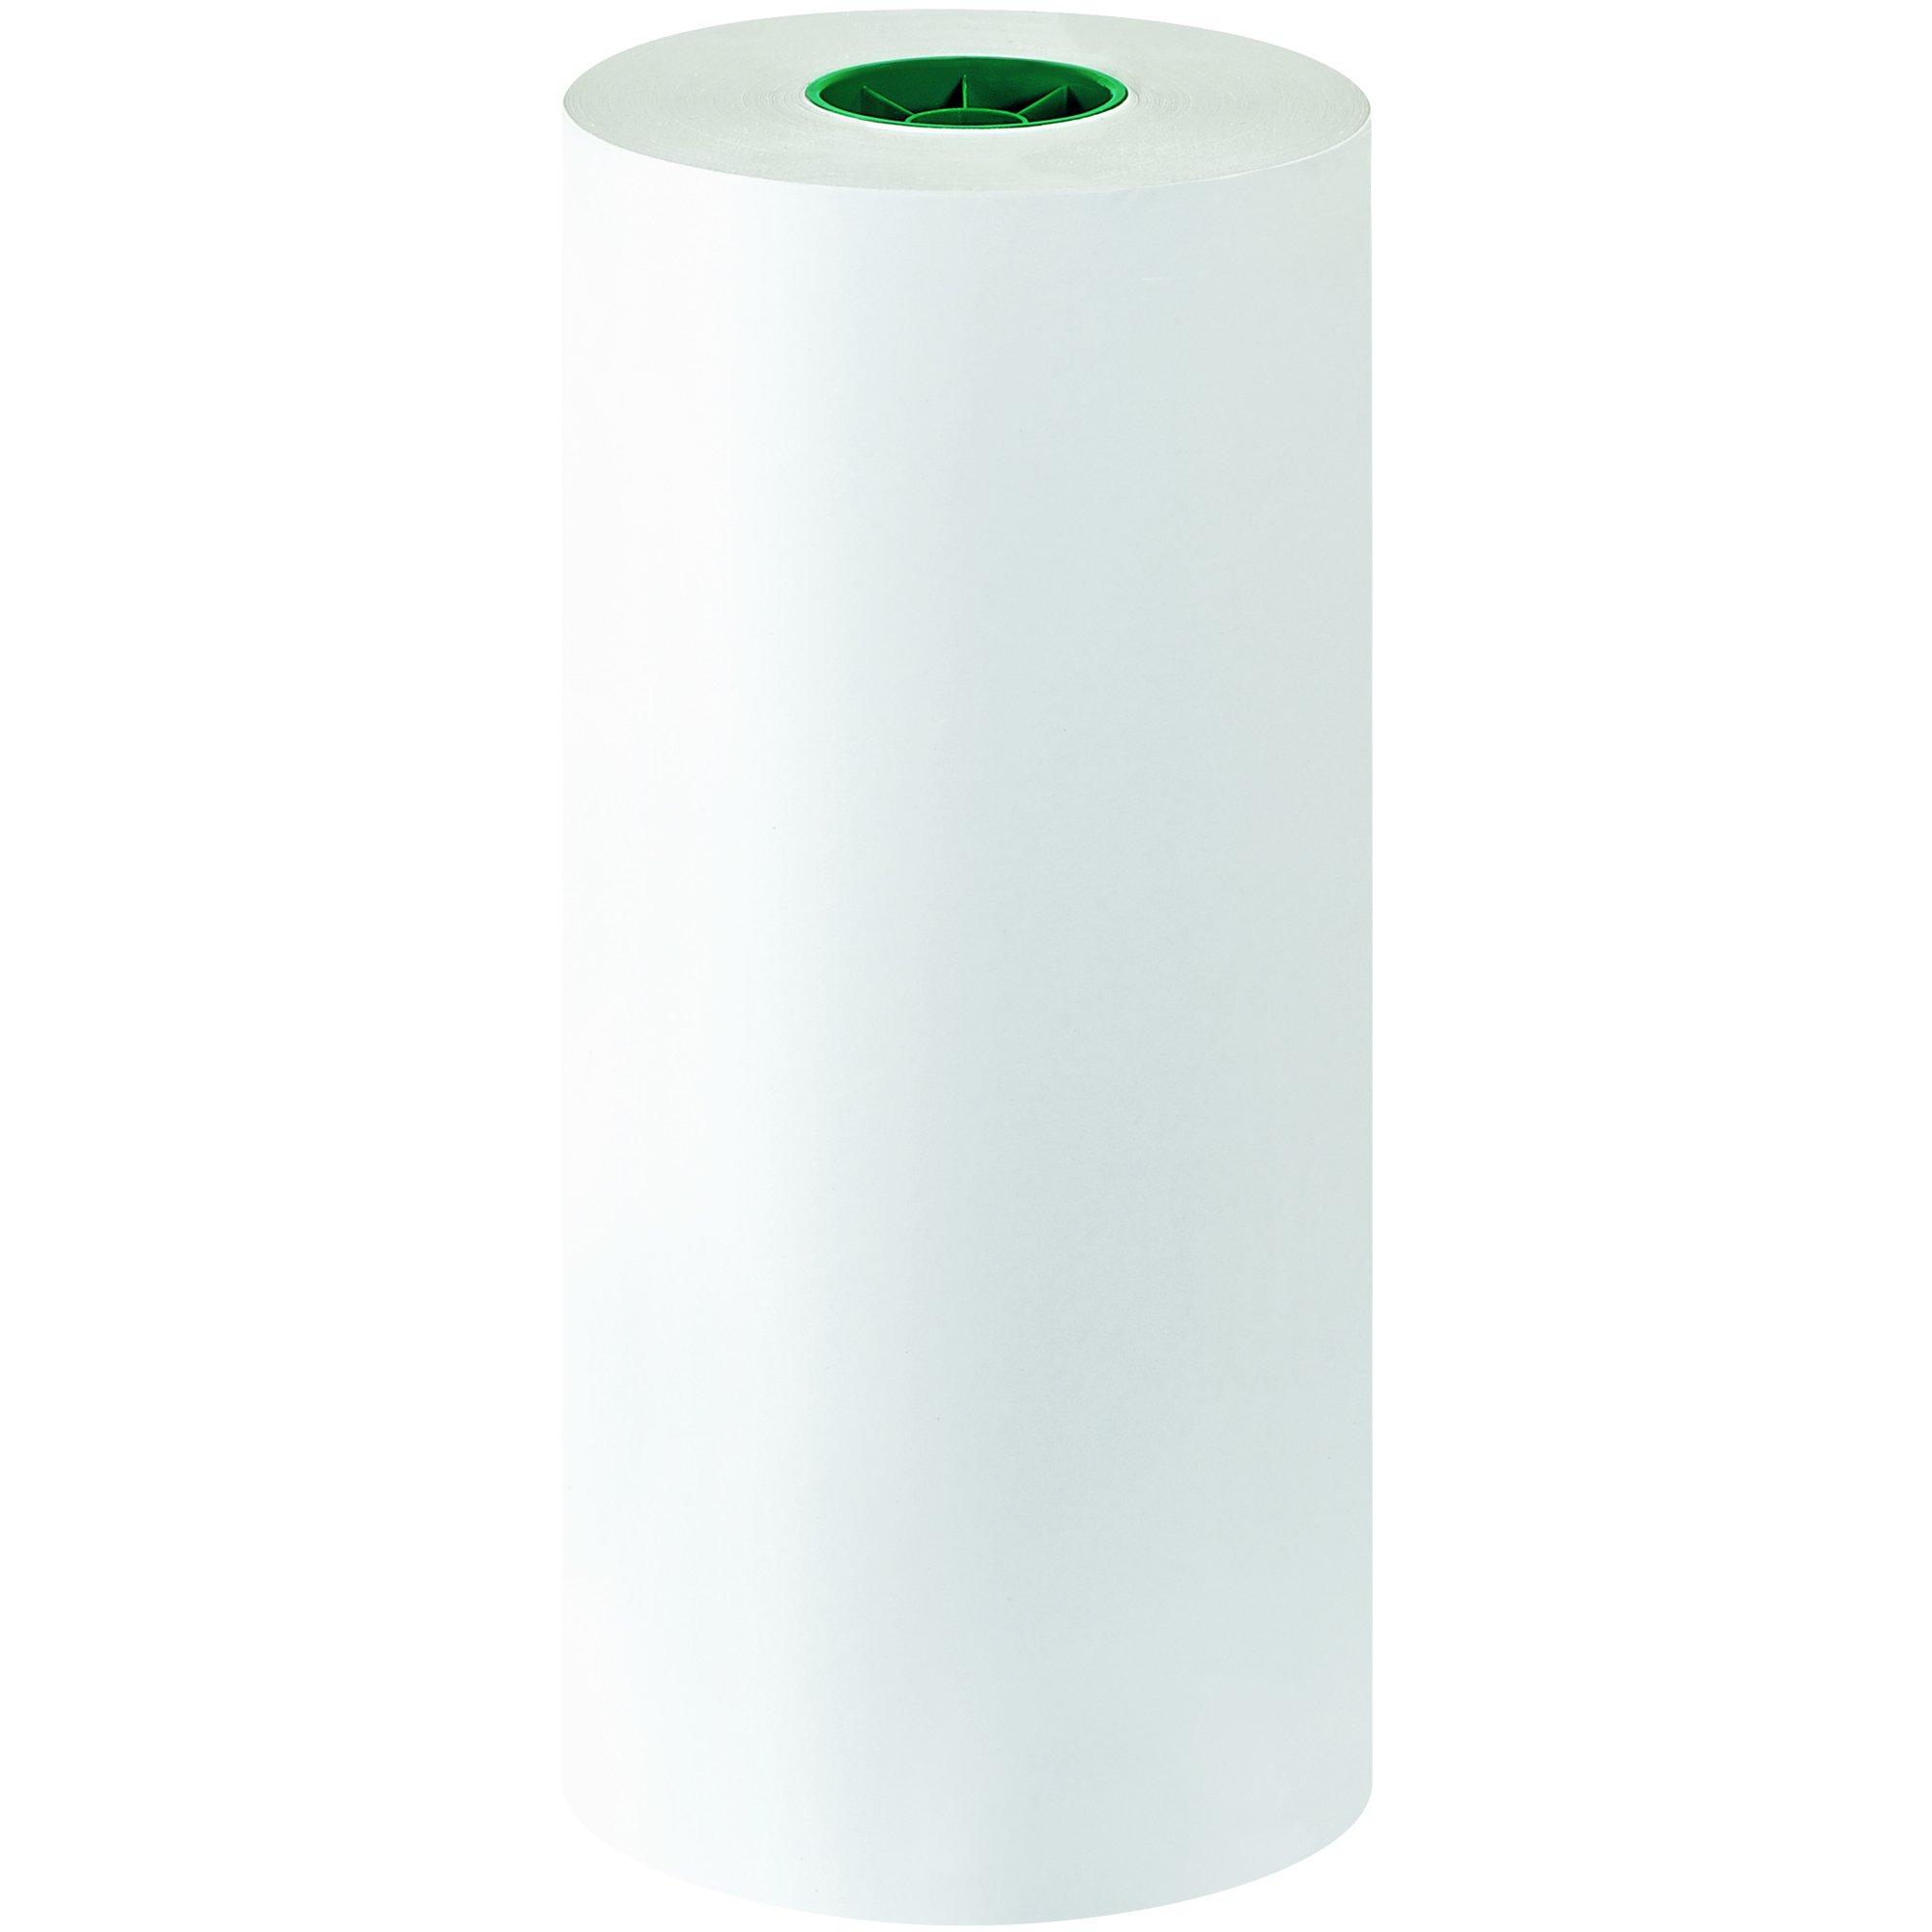 Aviditi Freezer Bleached Paper Roll, 1100' L x 18'' W, White (FP1840) by Aviditi